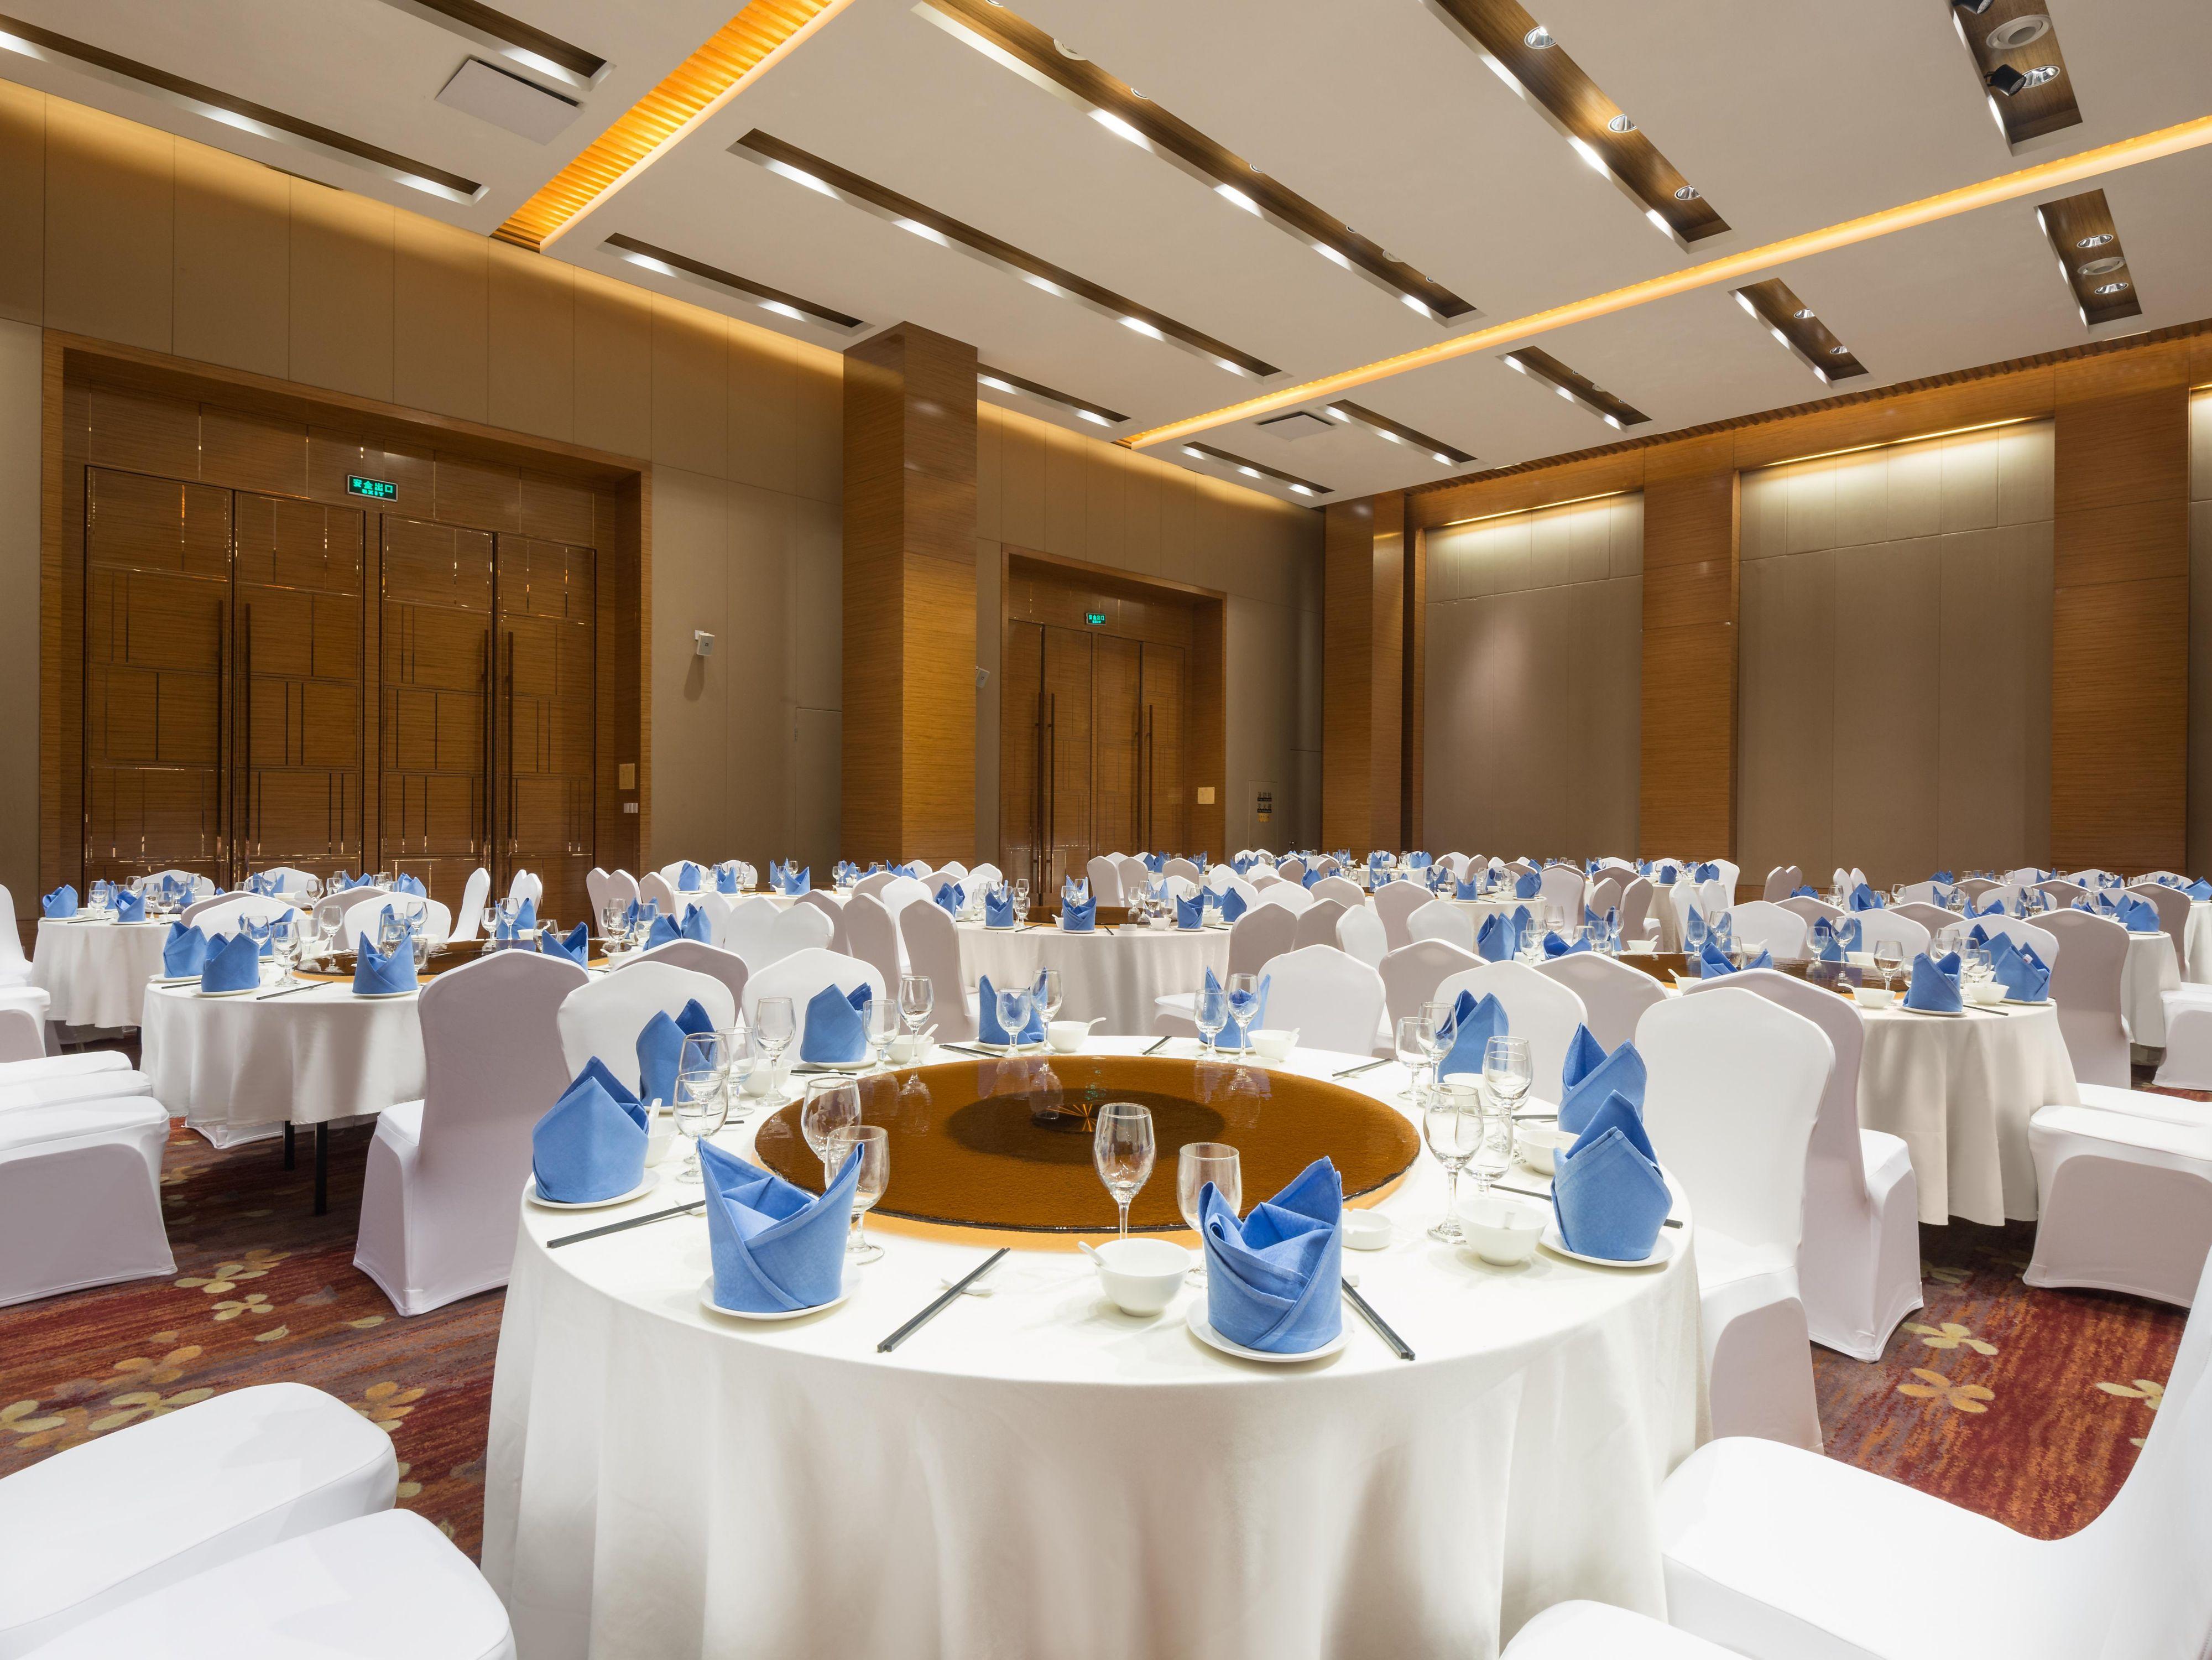 Crowne Plaza Chengdu Panda Garden - Hotel Meeting Rooms for Rent